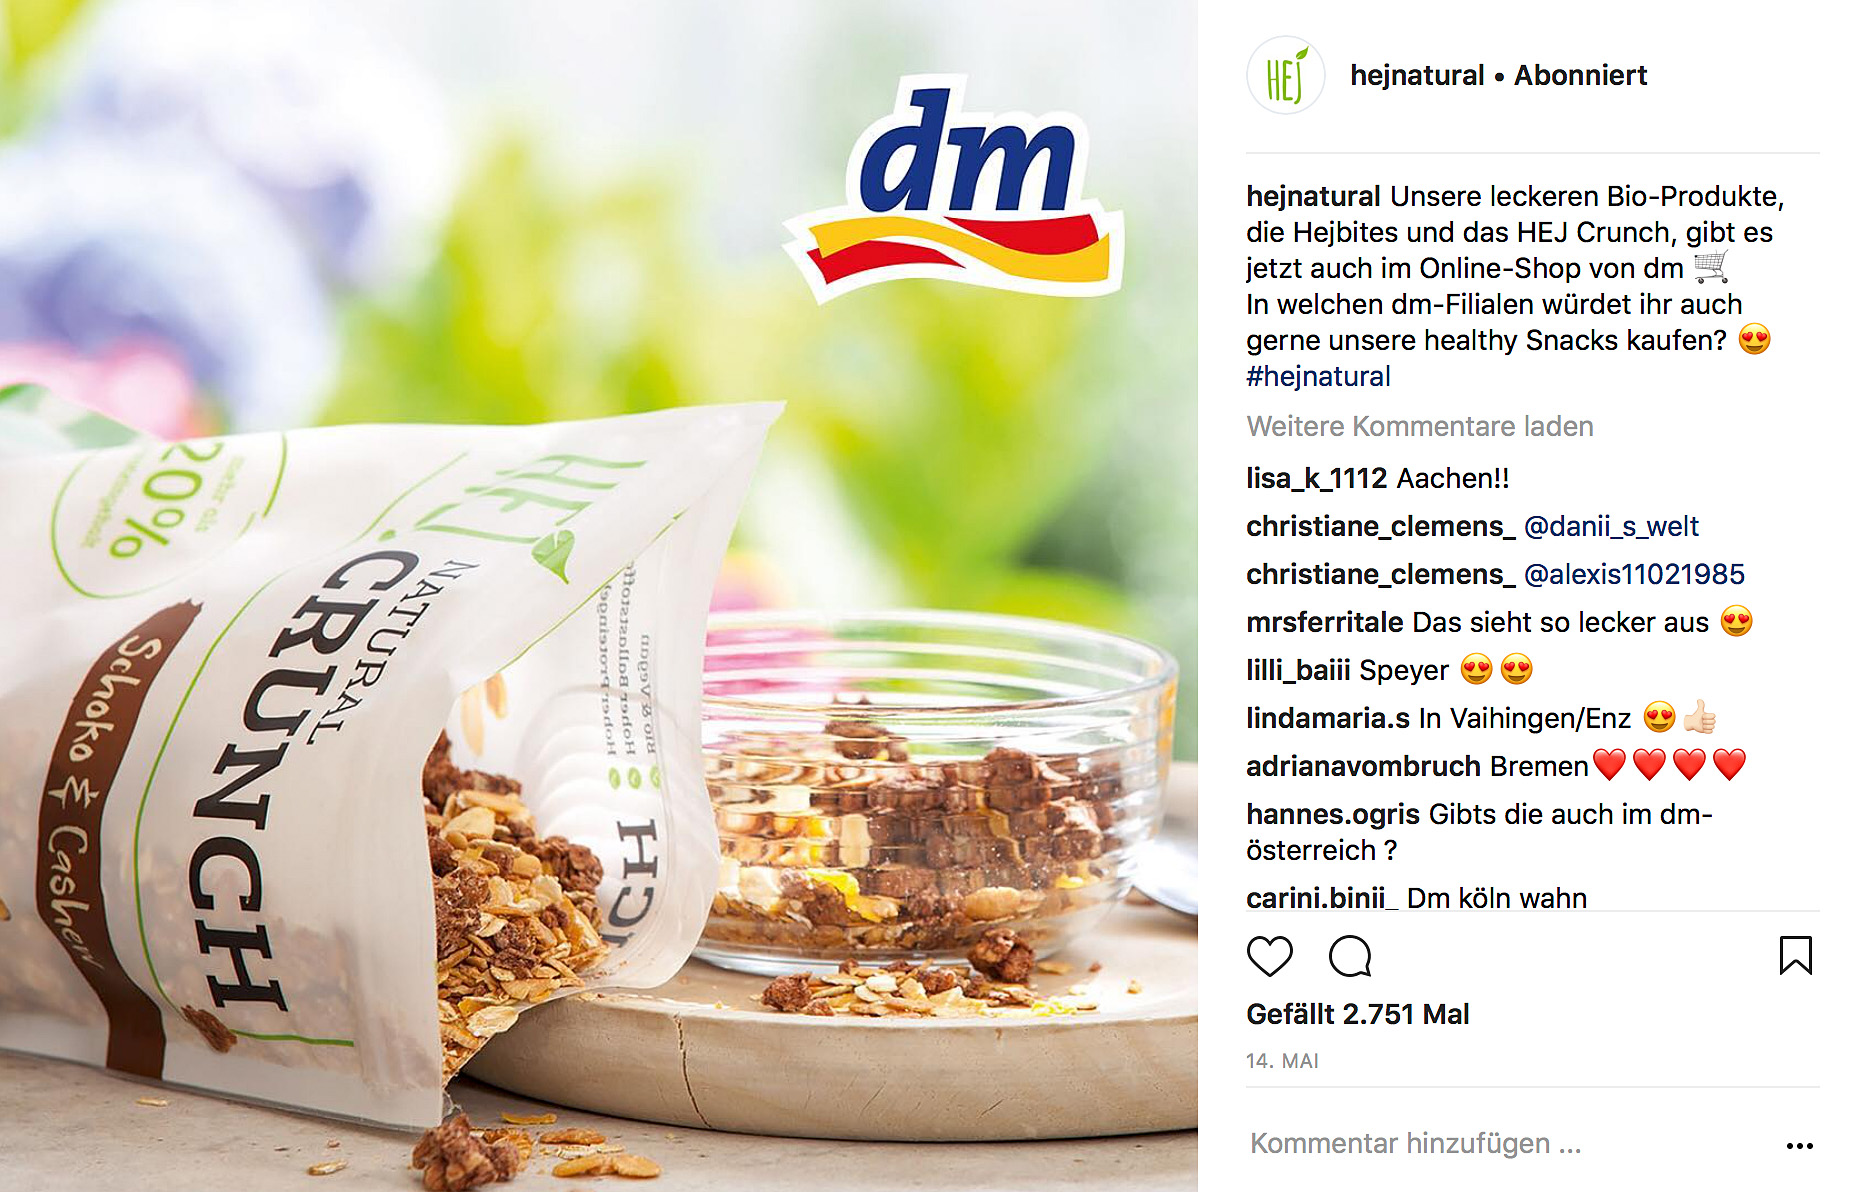 Instagram_HEJ_Crunch_dm-1.jpg